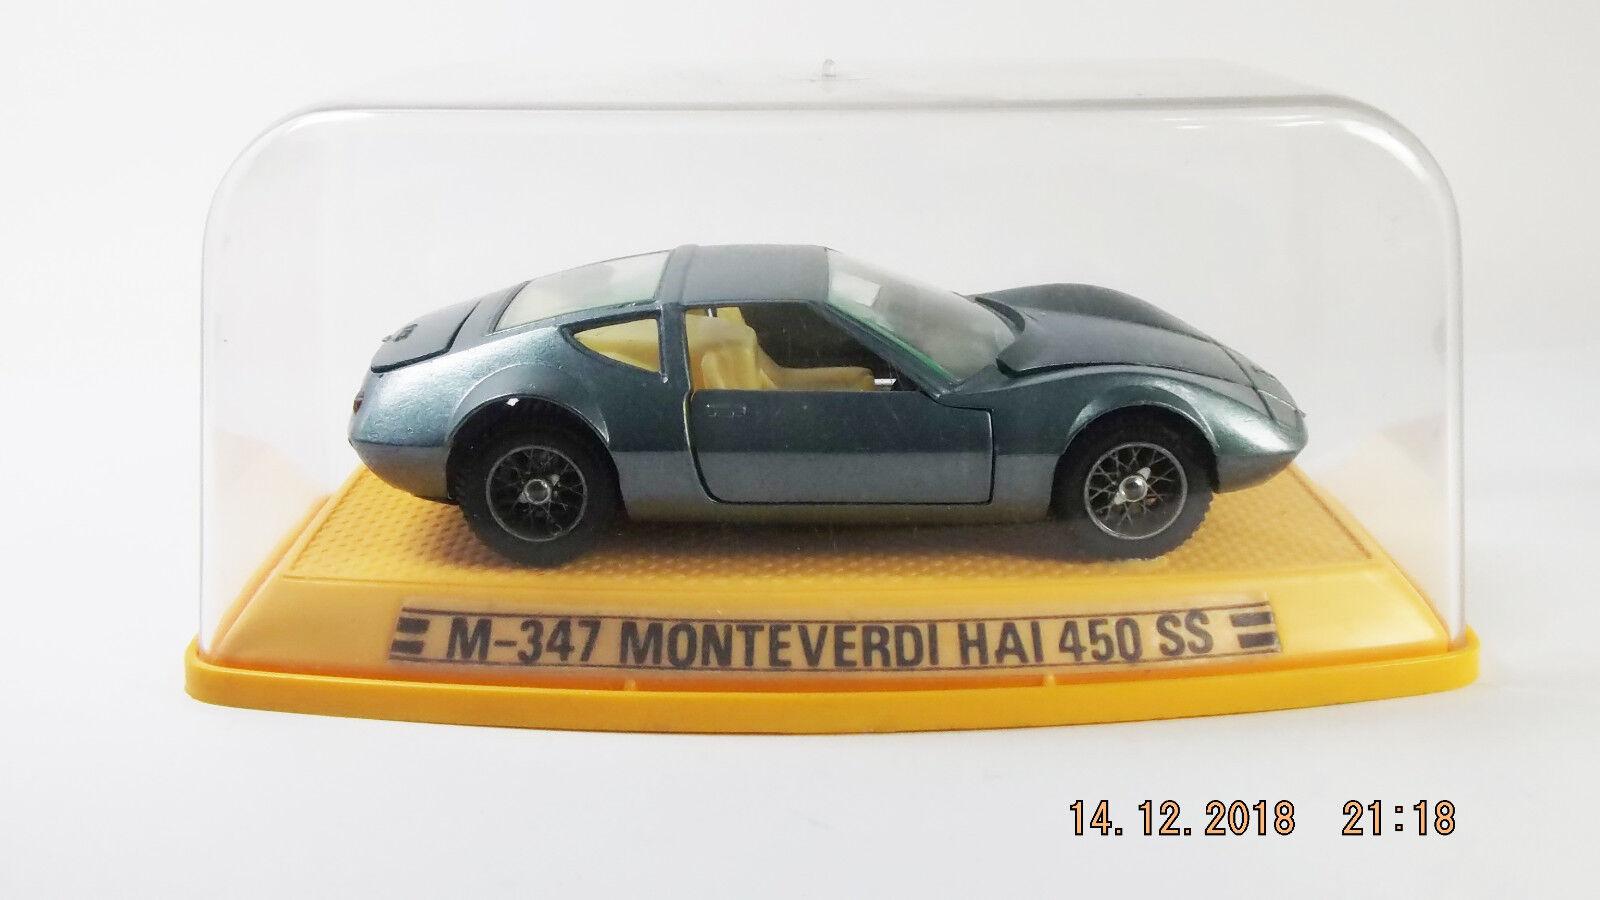 Monteverdi HAI 450 SS azul metallizzato 1 43 Pilen M347, boxed